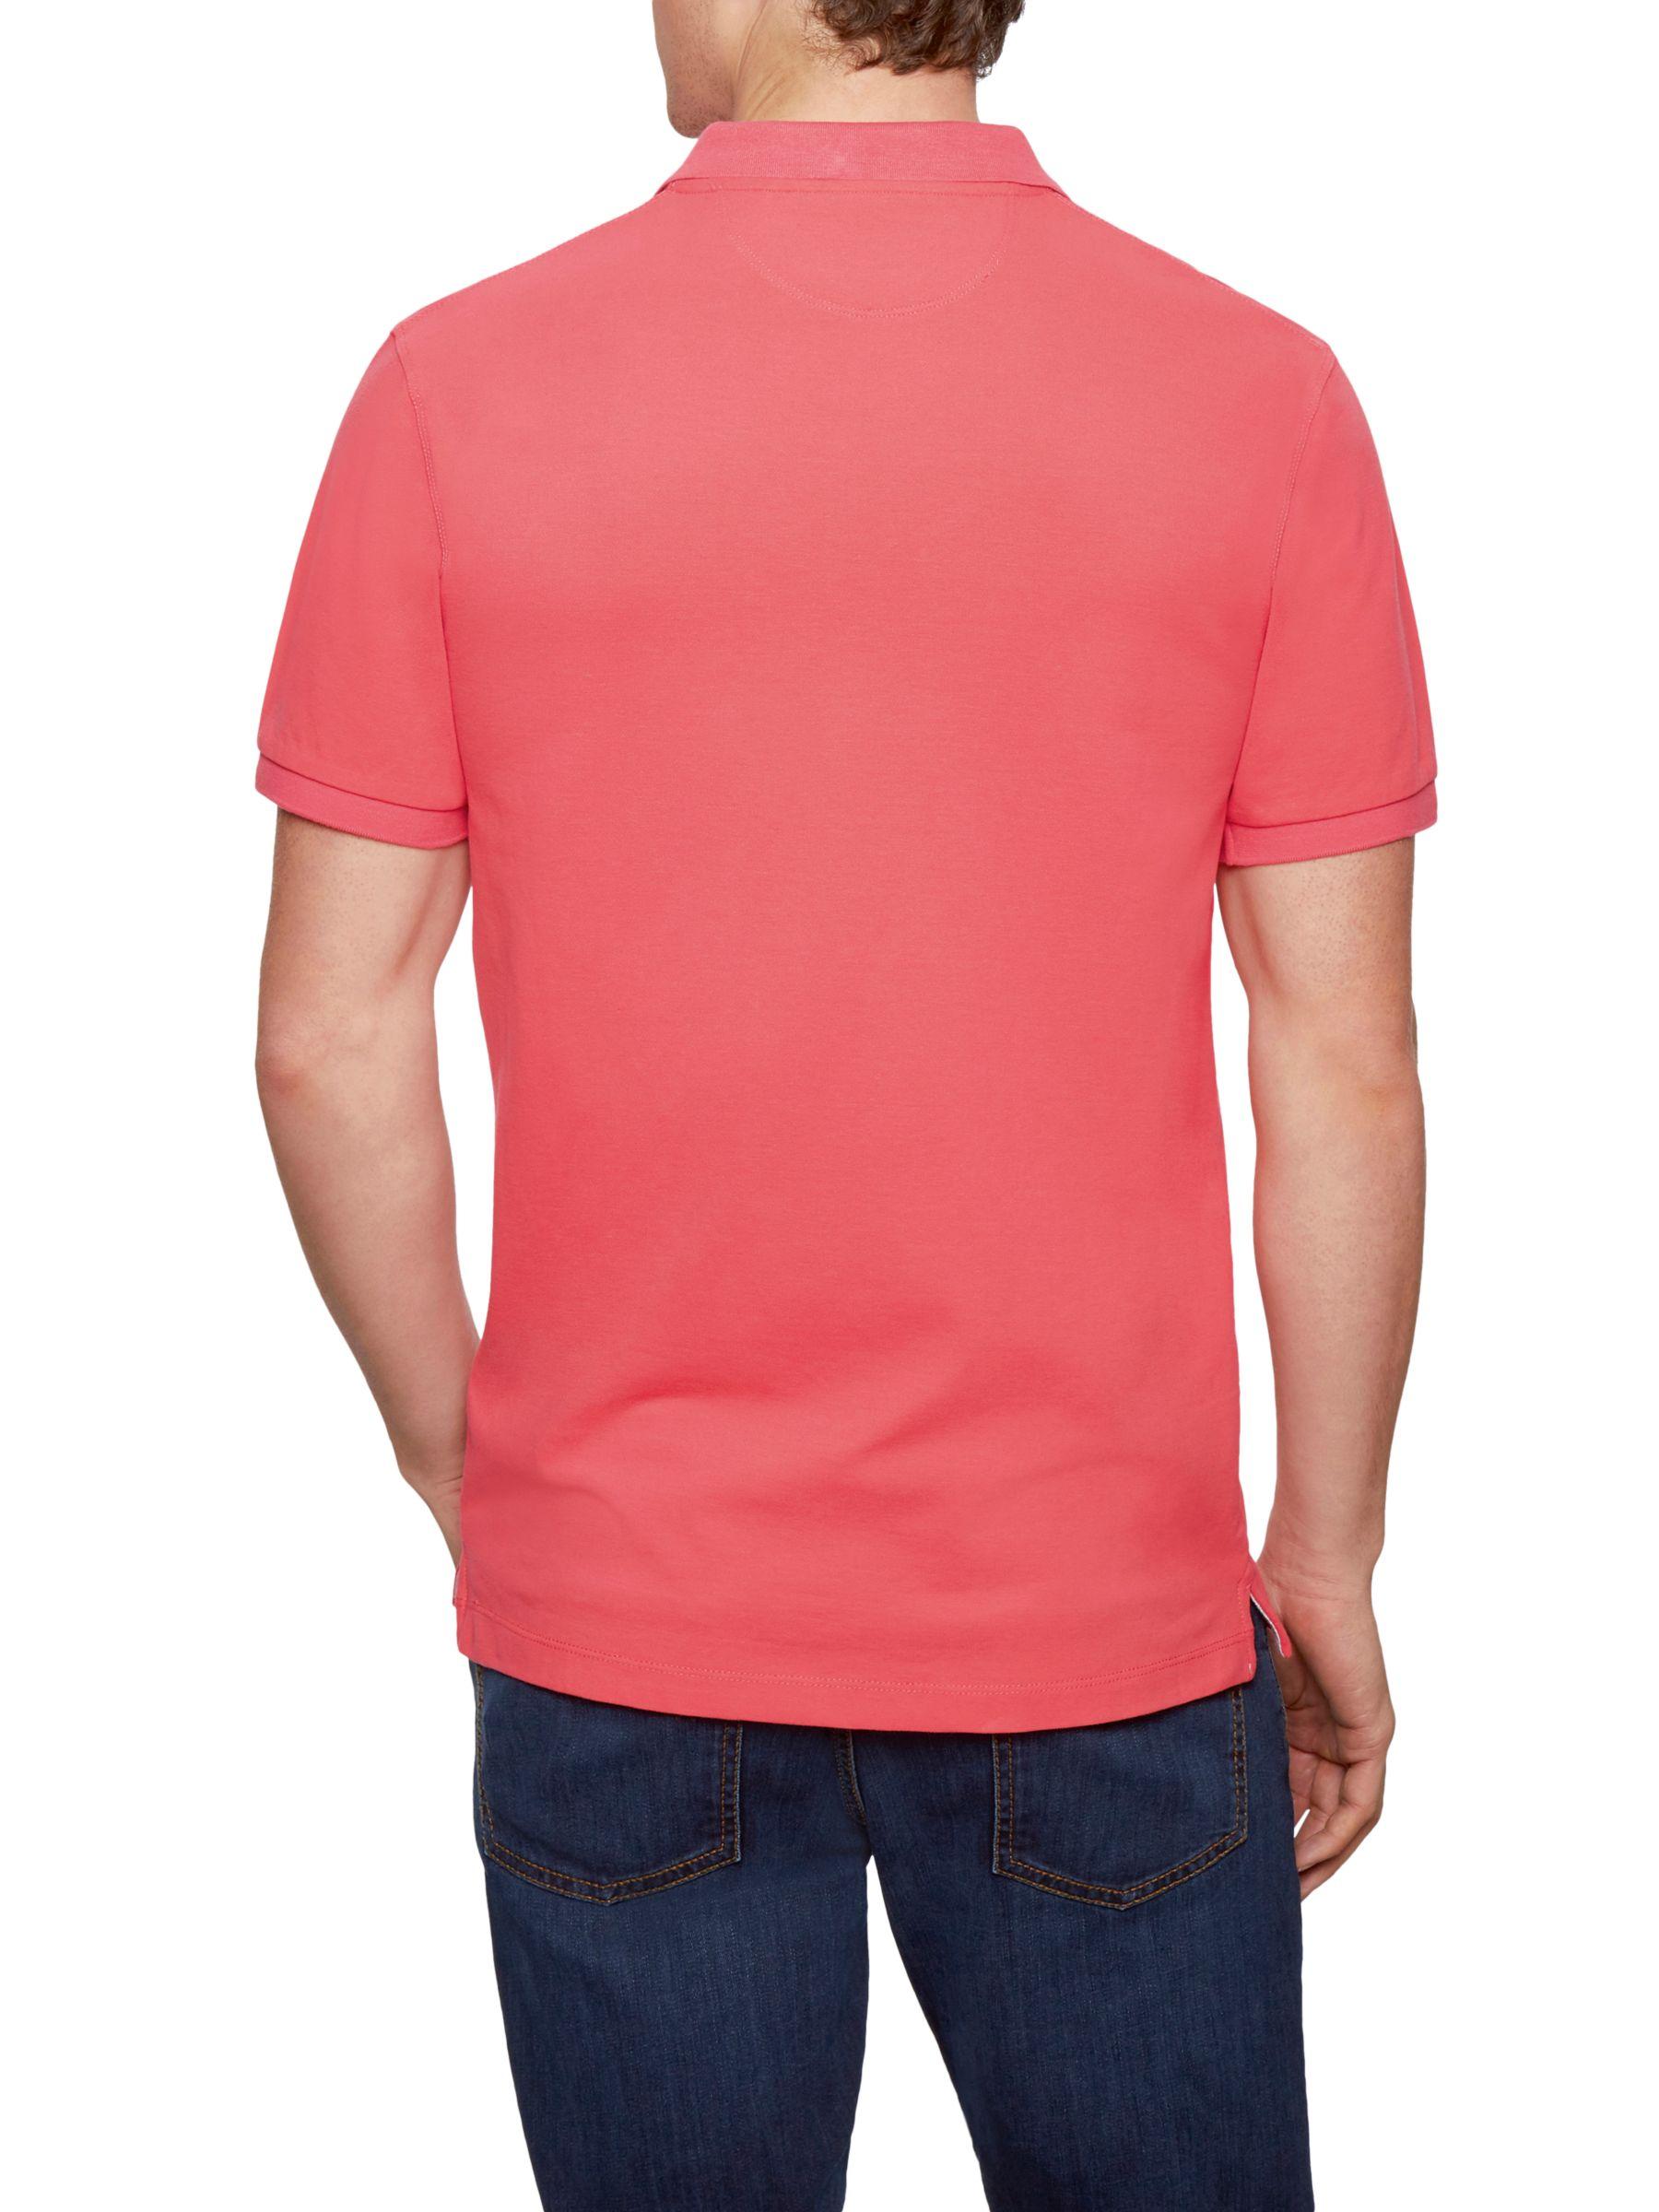 Hackett London Hackett London New Classic Number Polo Shirt